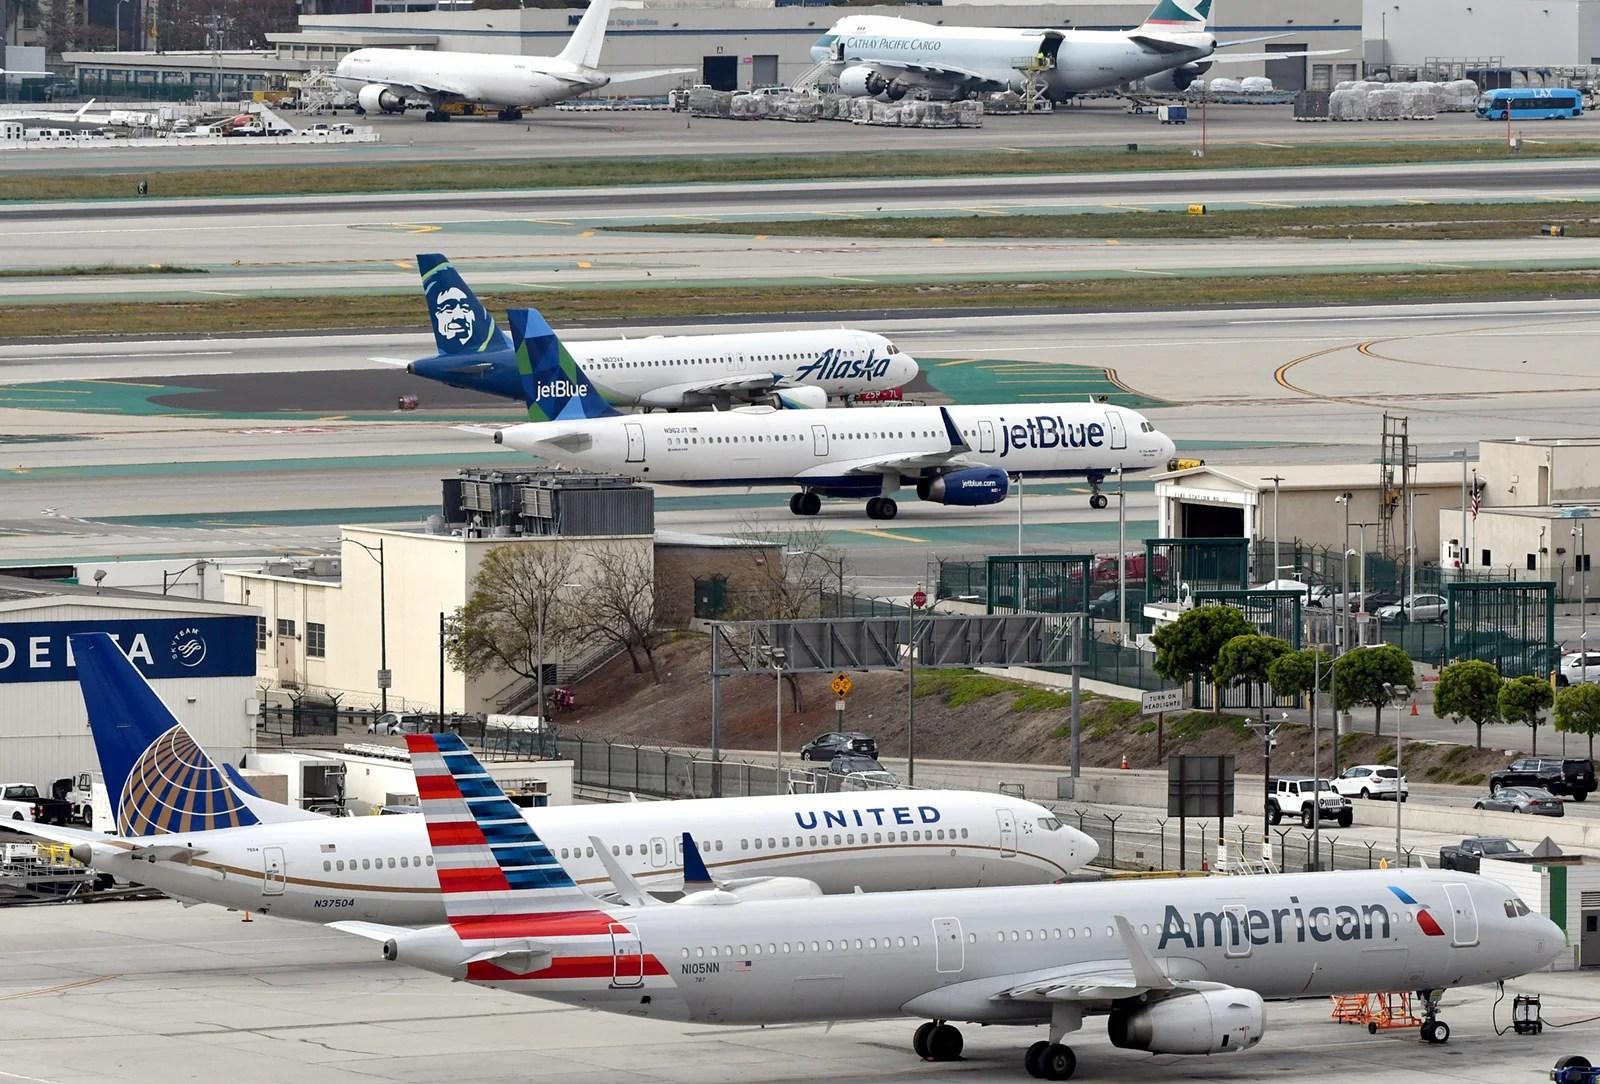 Deal alert: Transcontinental flights from $97 round-trip